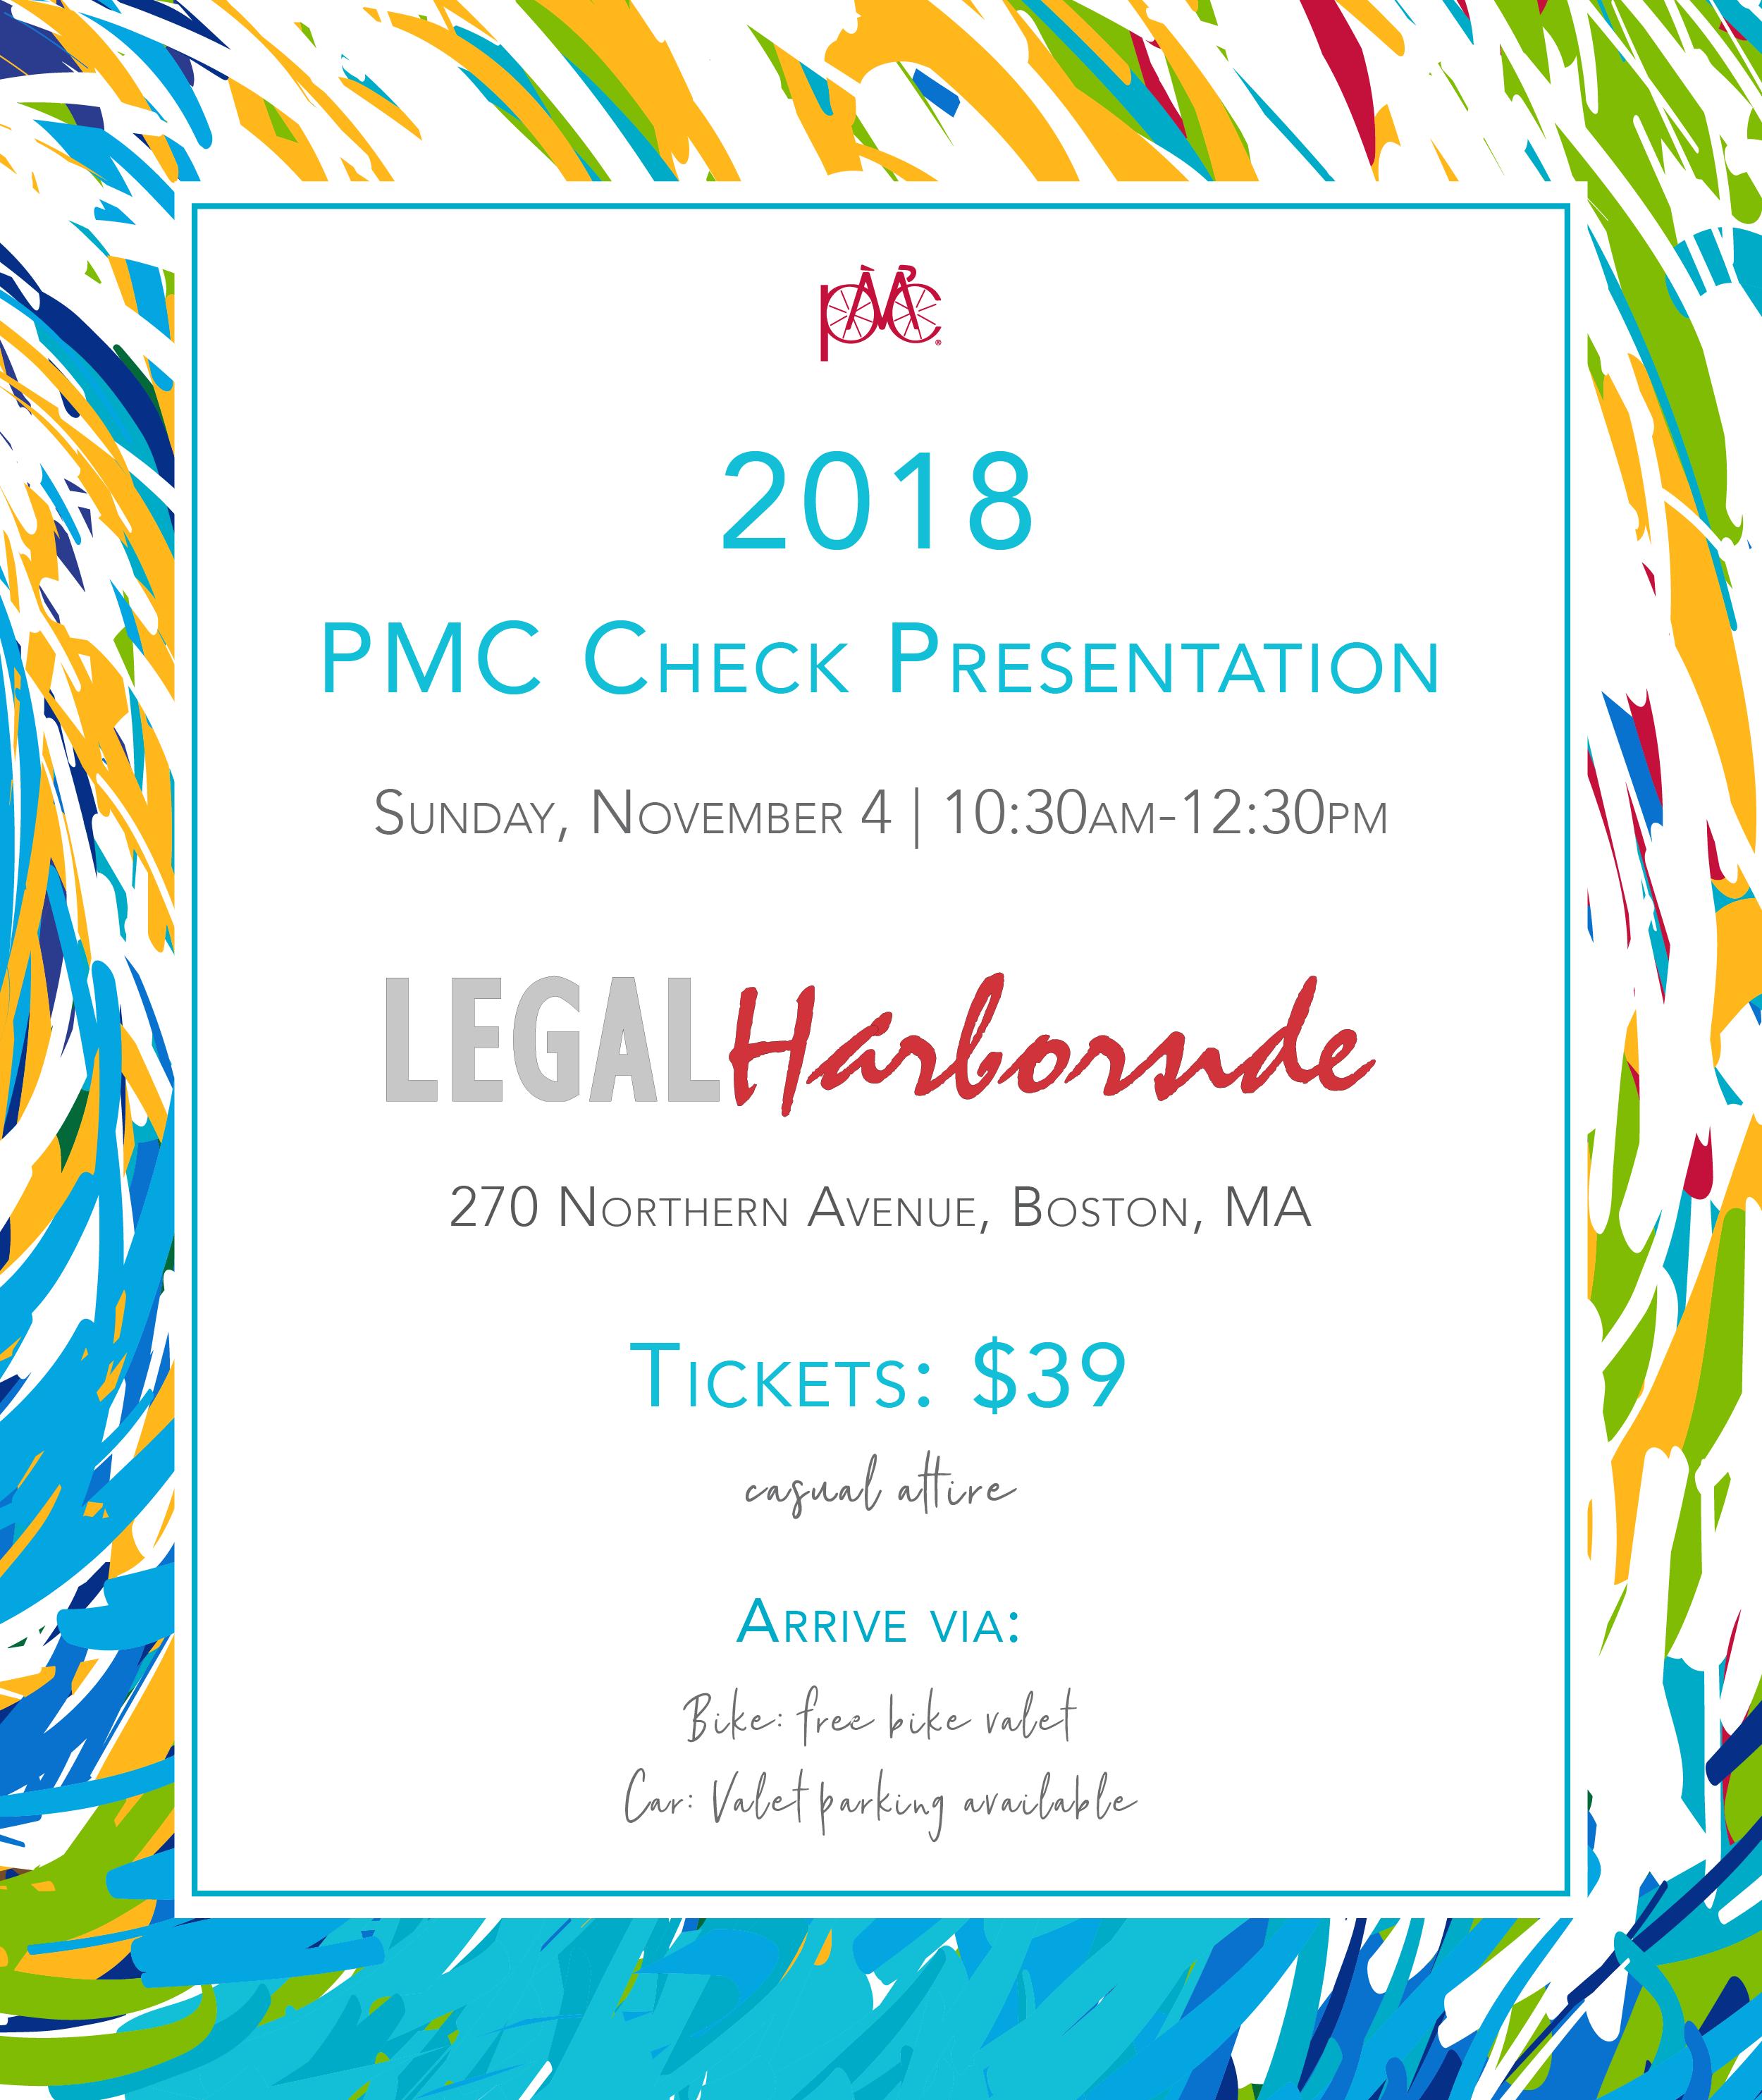 2018 PMC Check Presentation at Legal Harborside